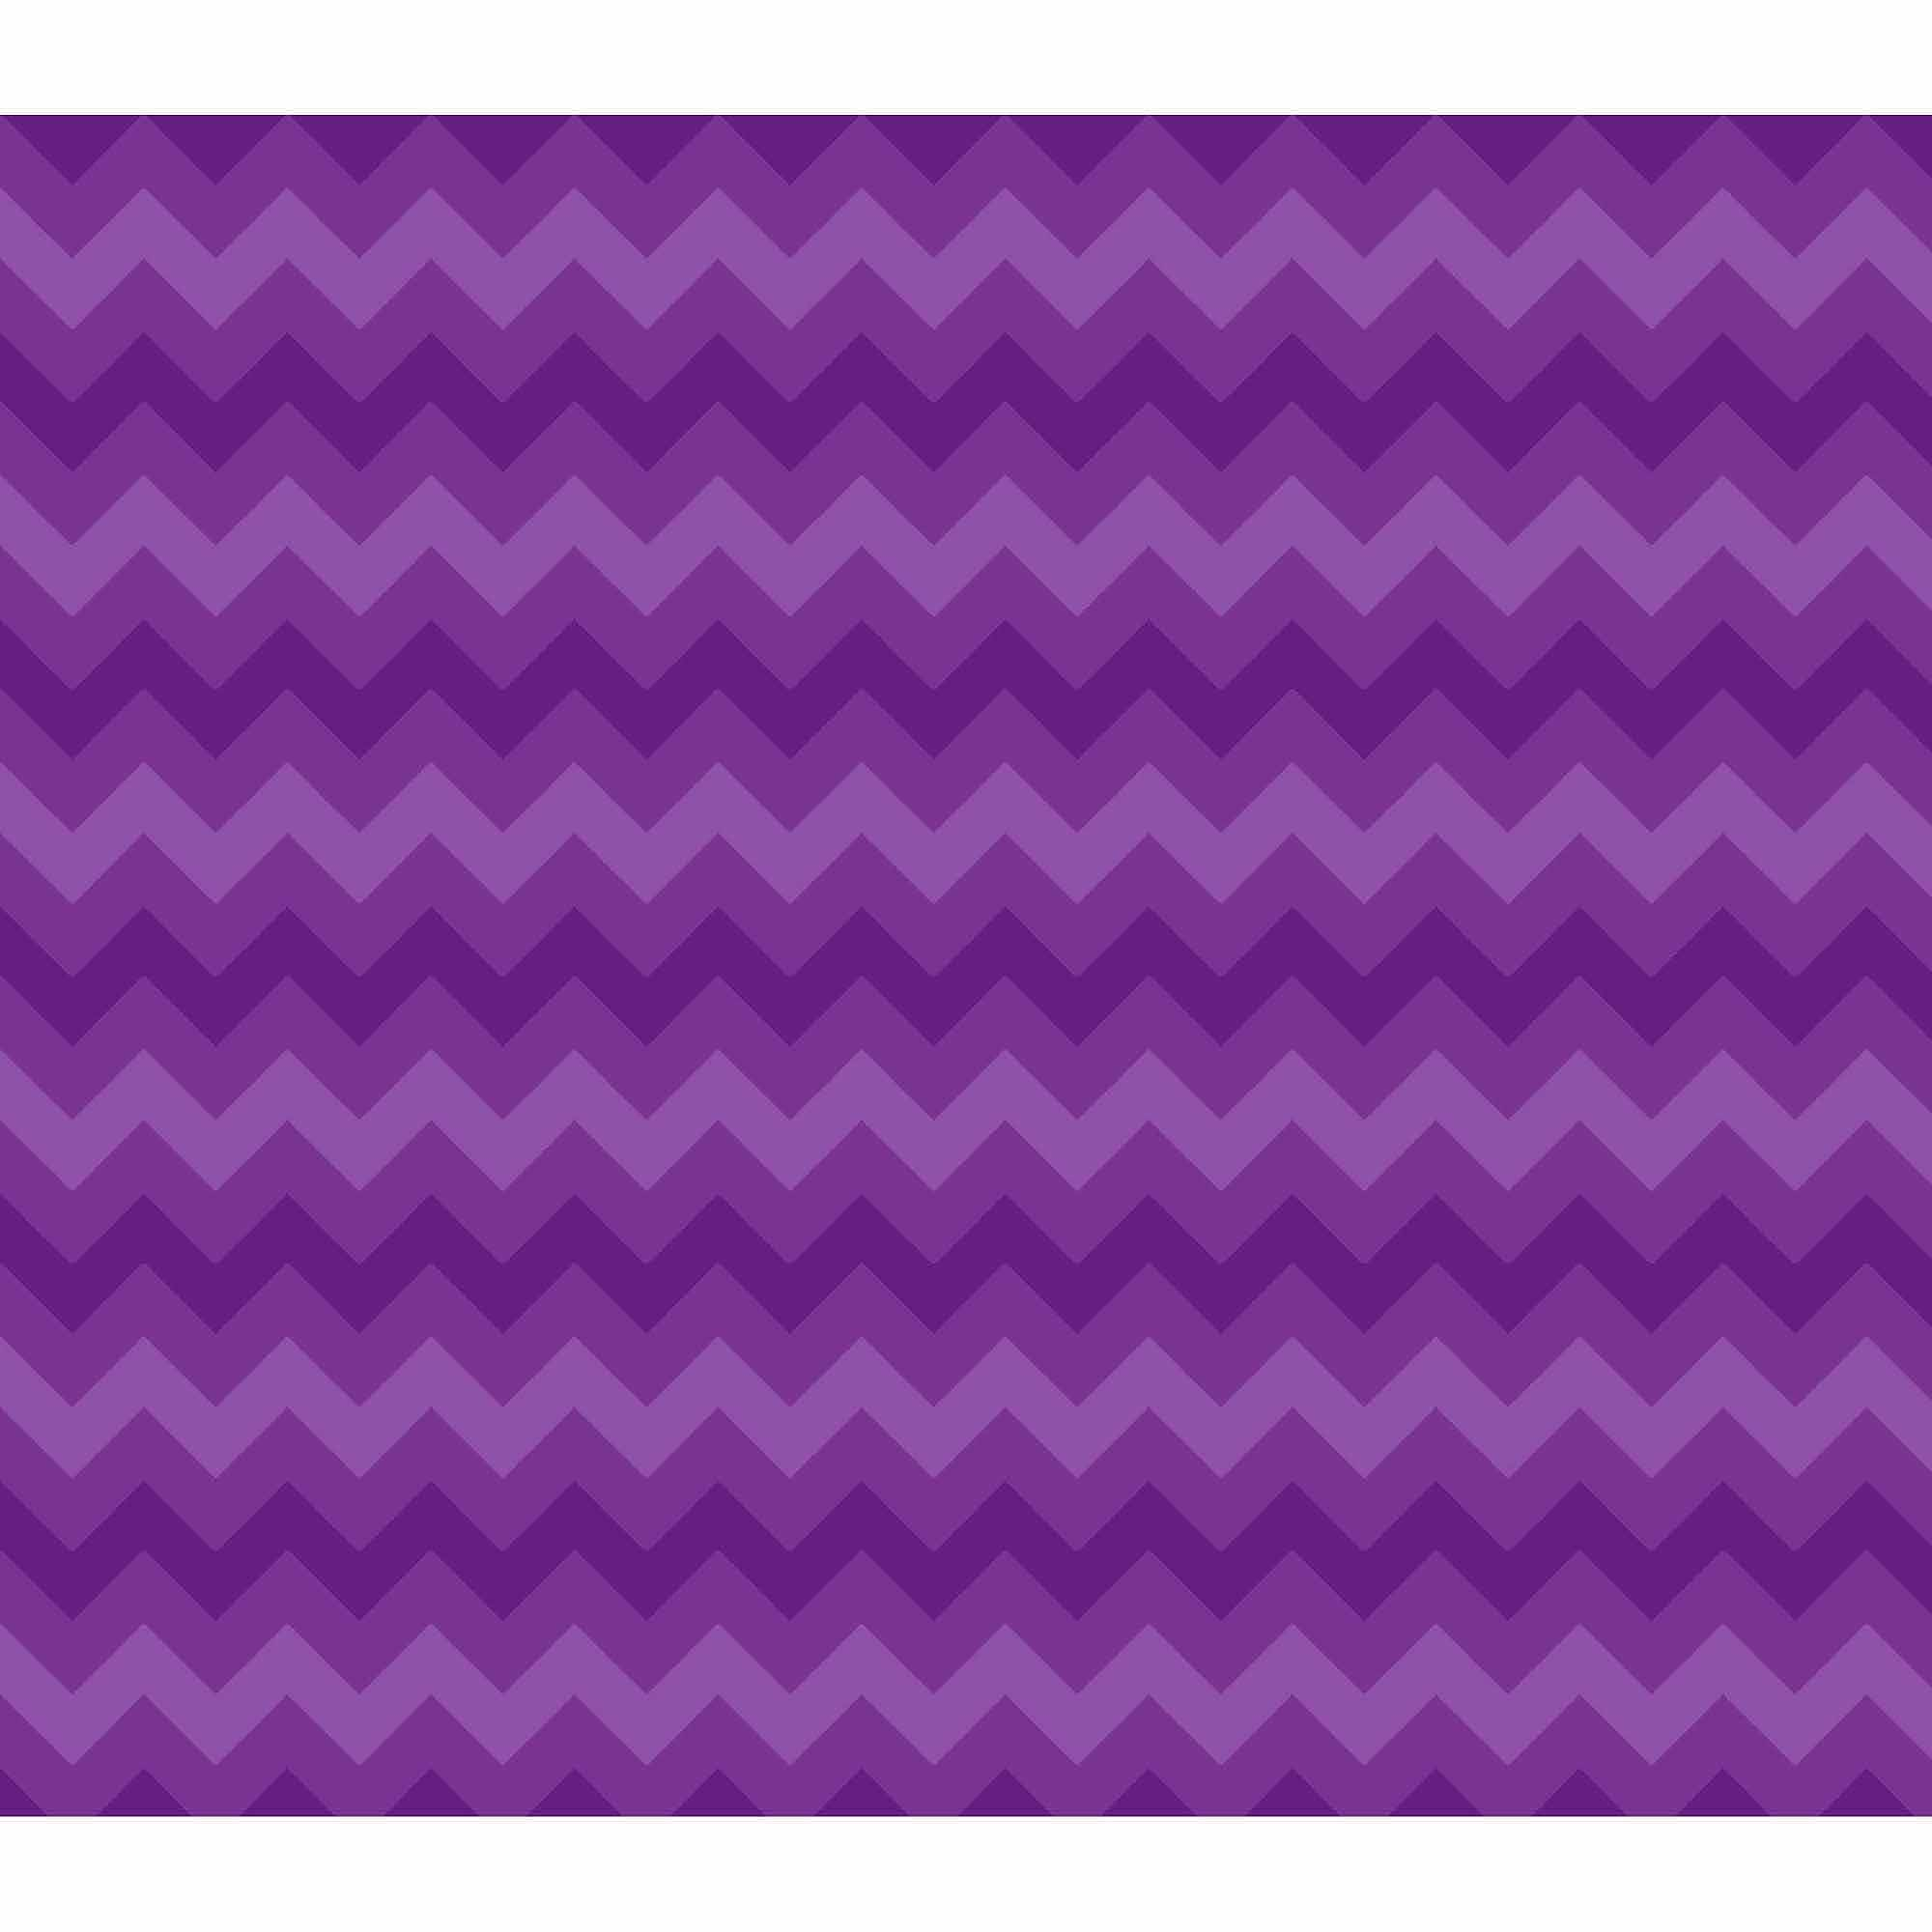 Springs Creative Cotton Blenders Tonal Chevron, Purple, Fabric by the Yard